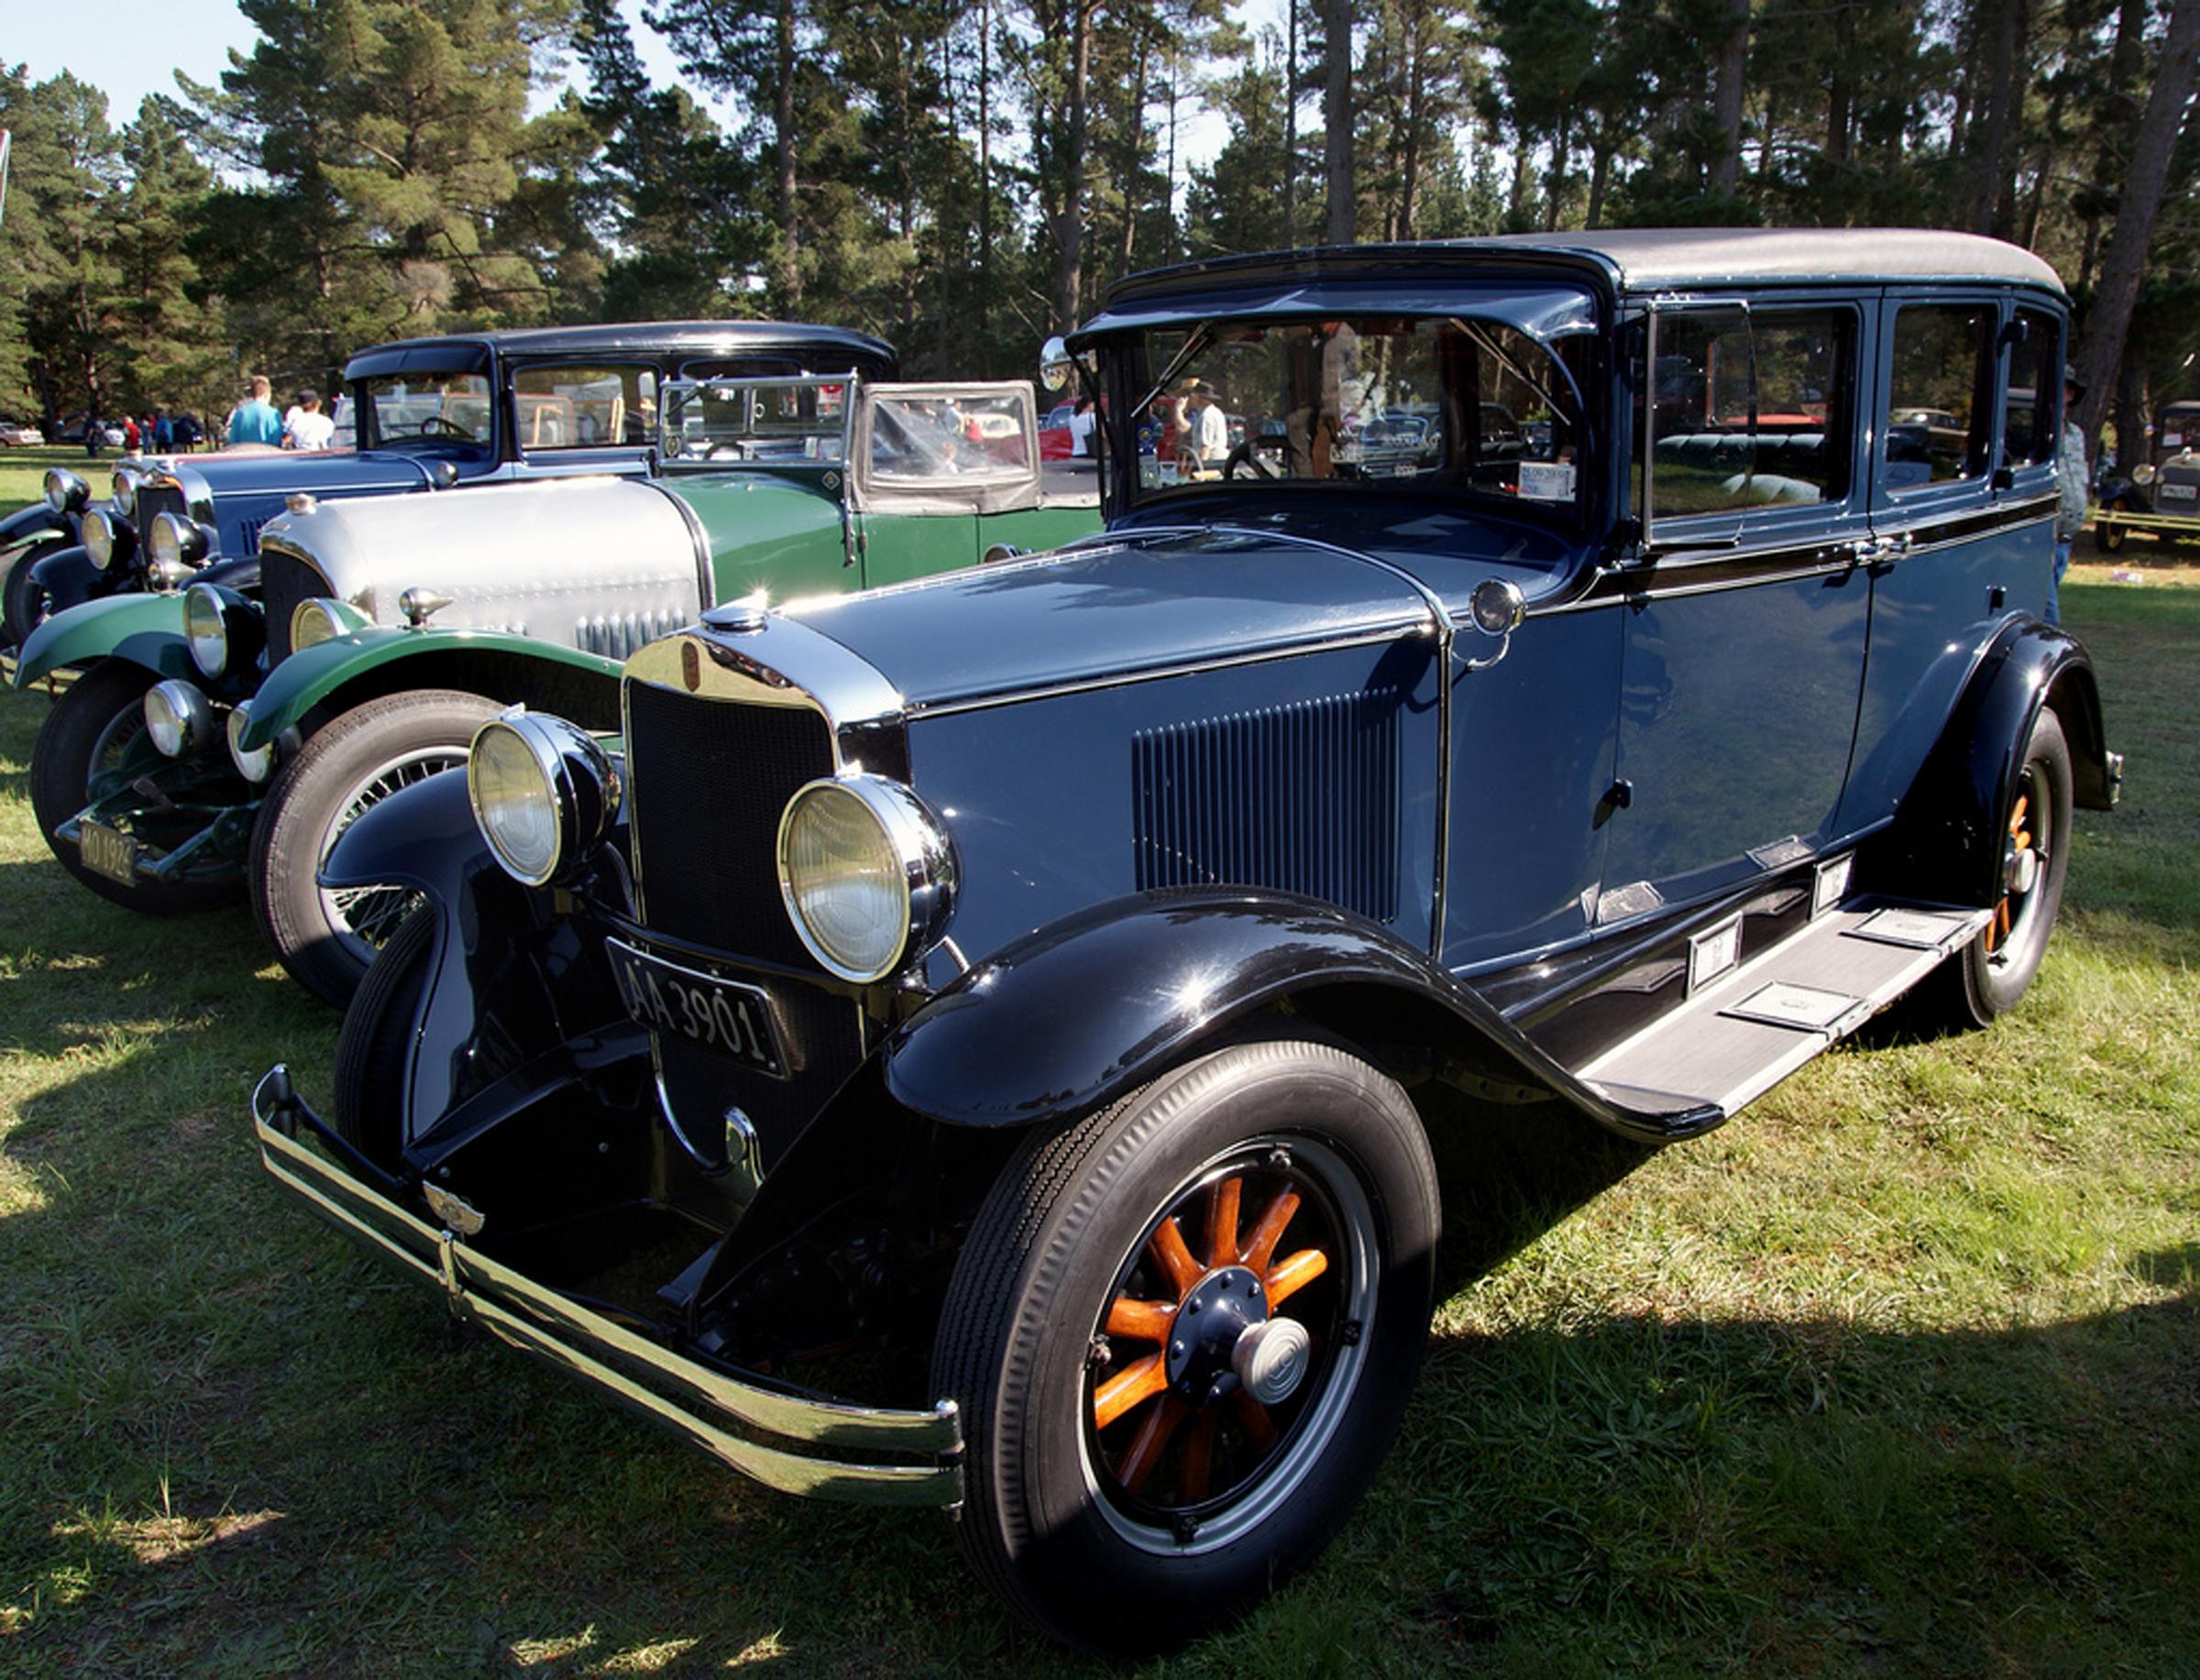 File:1929 Graham-Paige 612 (14417338853).jpg - Wikimedia Commons